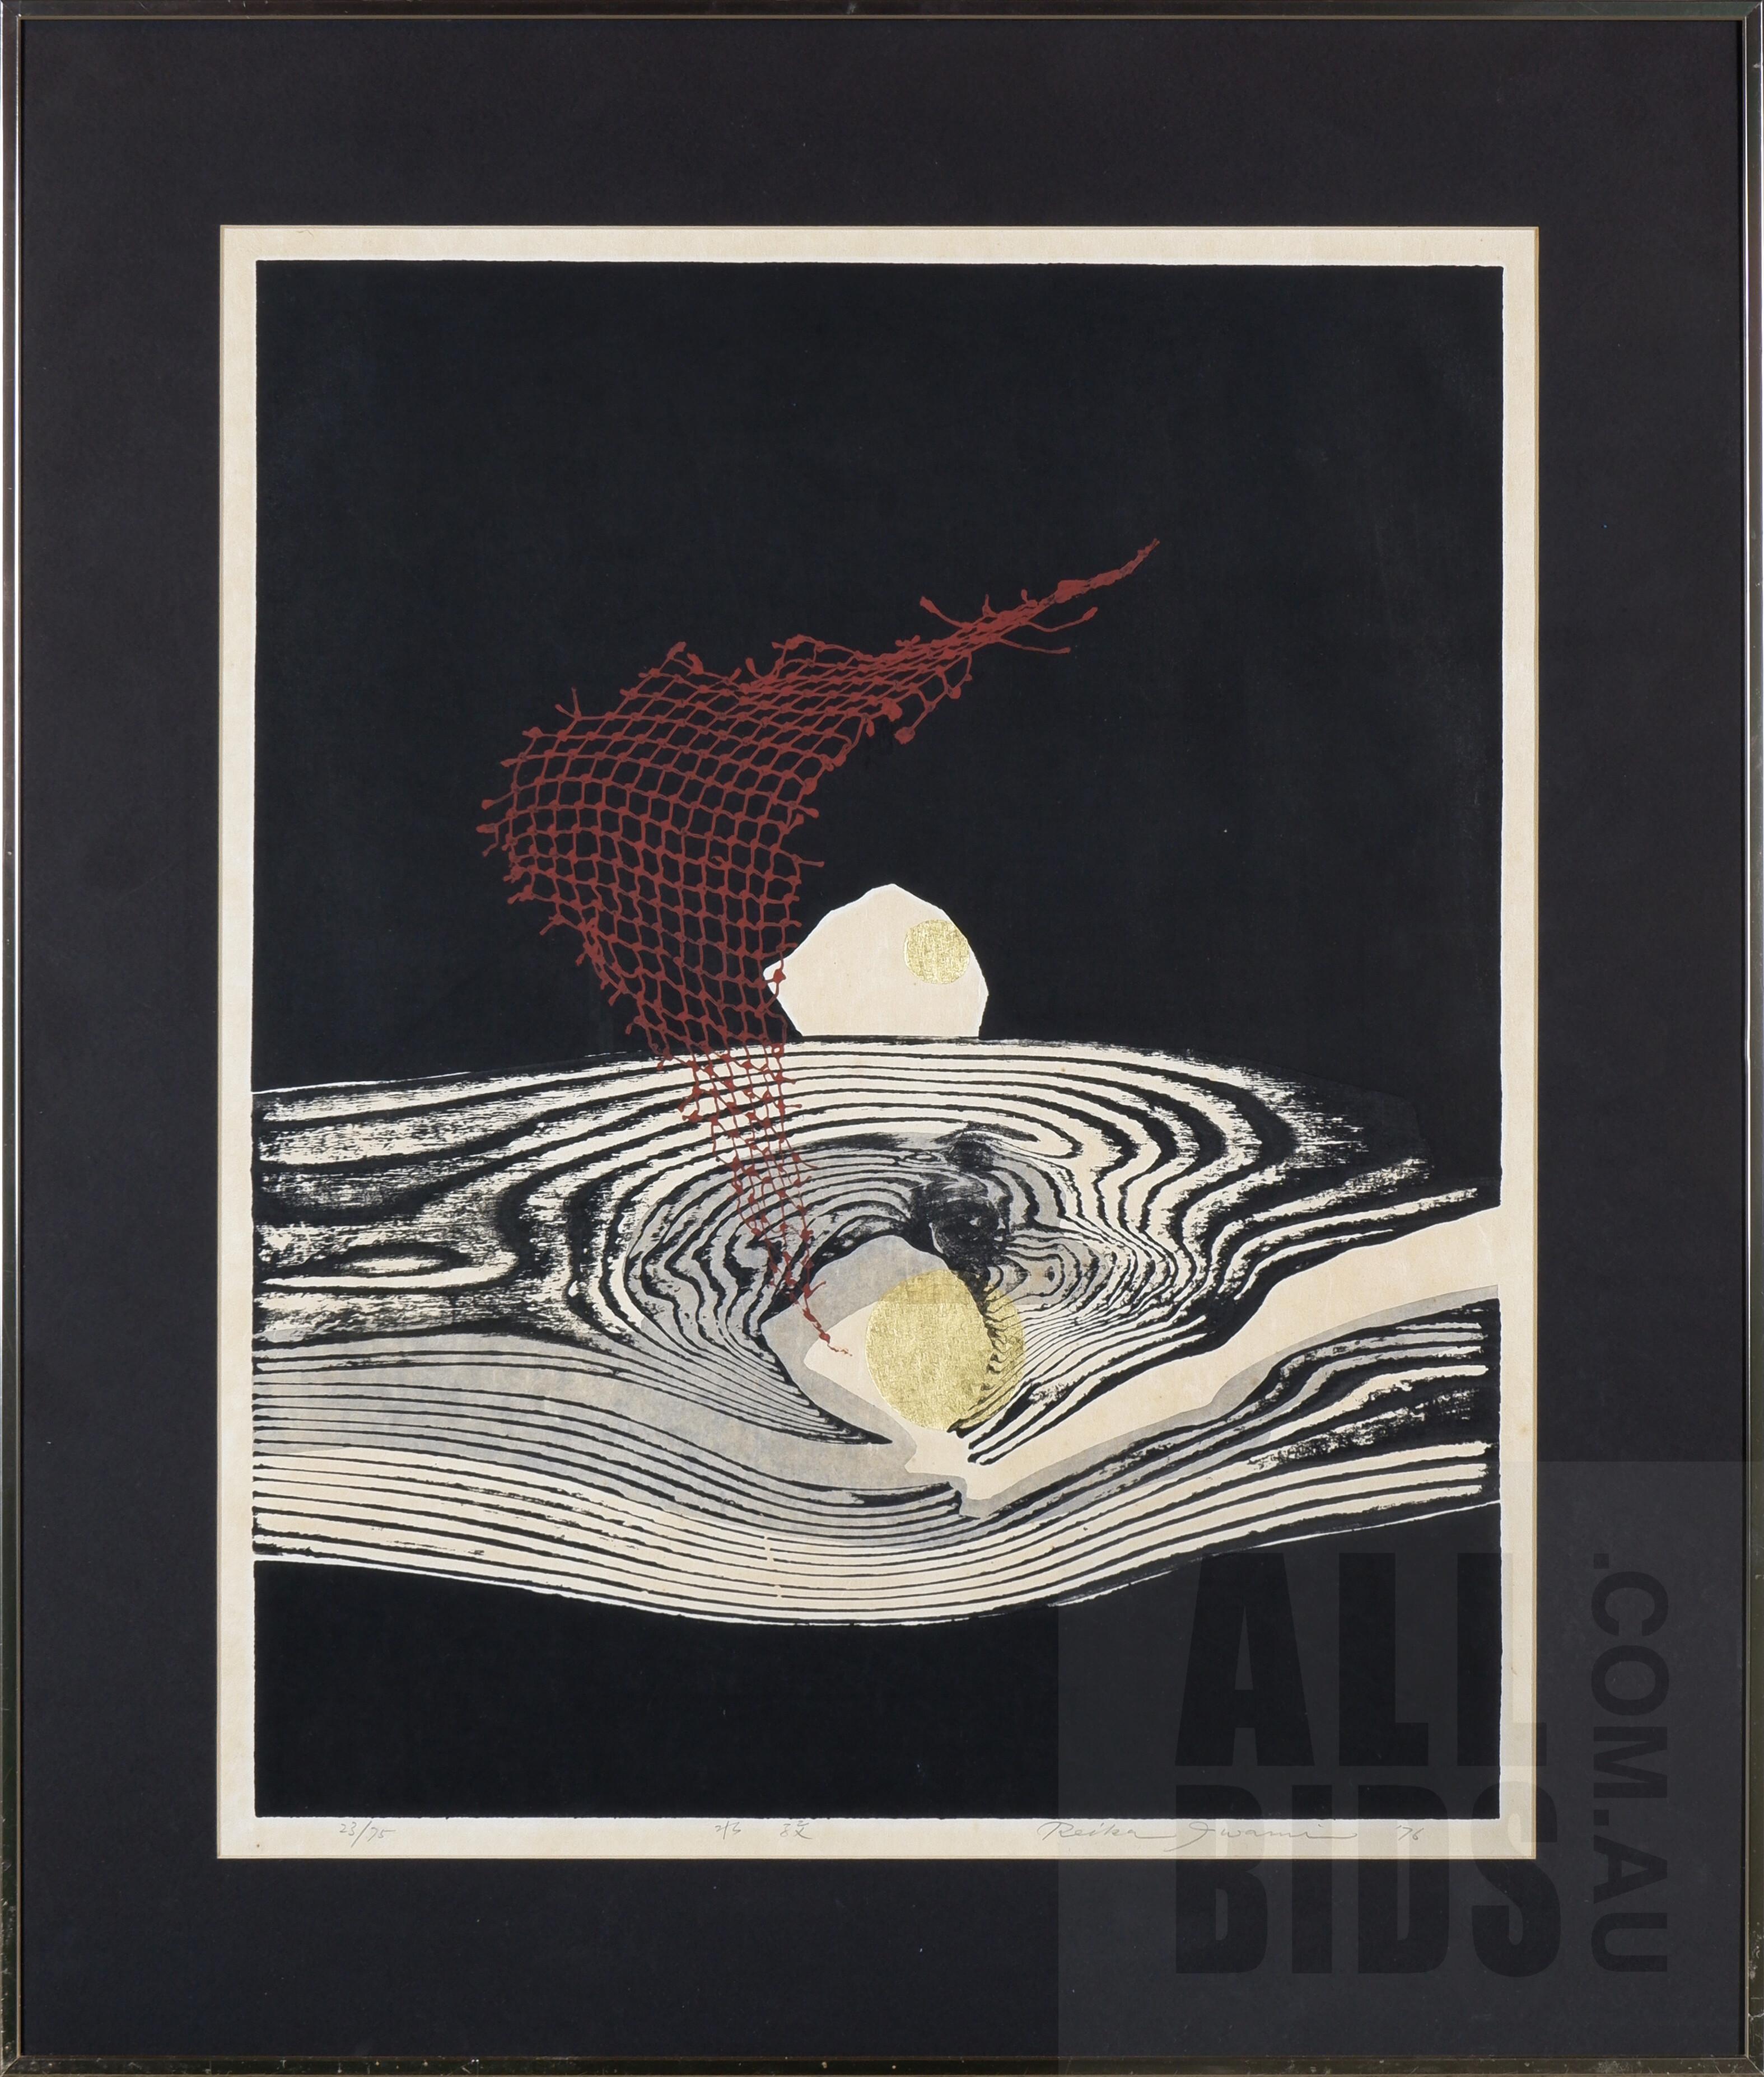 'Reika Iwami (1927-2020 Japanese), Water Ripples 1976, Woodblock, 66 x 50 cm (image size)'